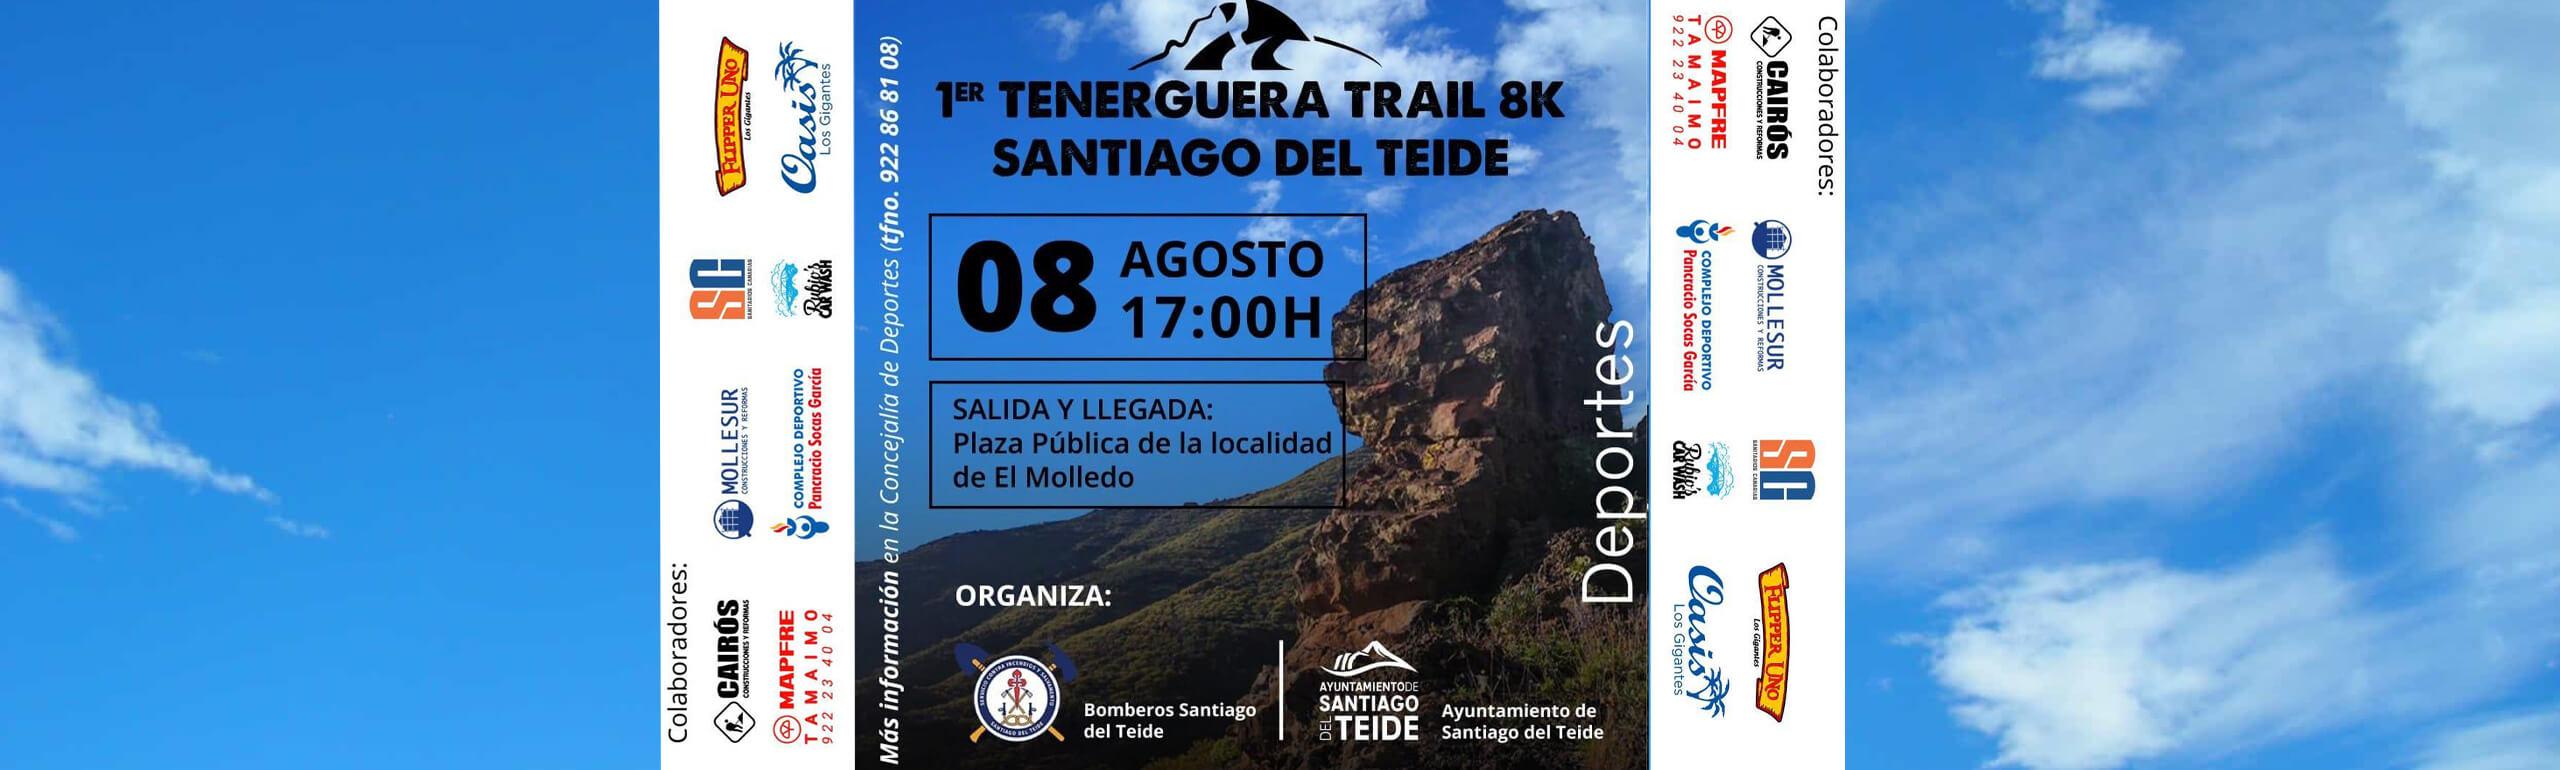 Listado Tenerguera Trail